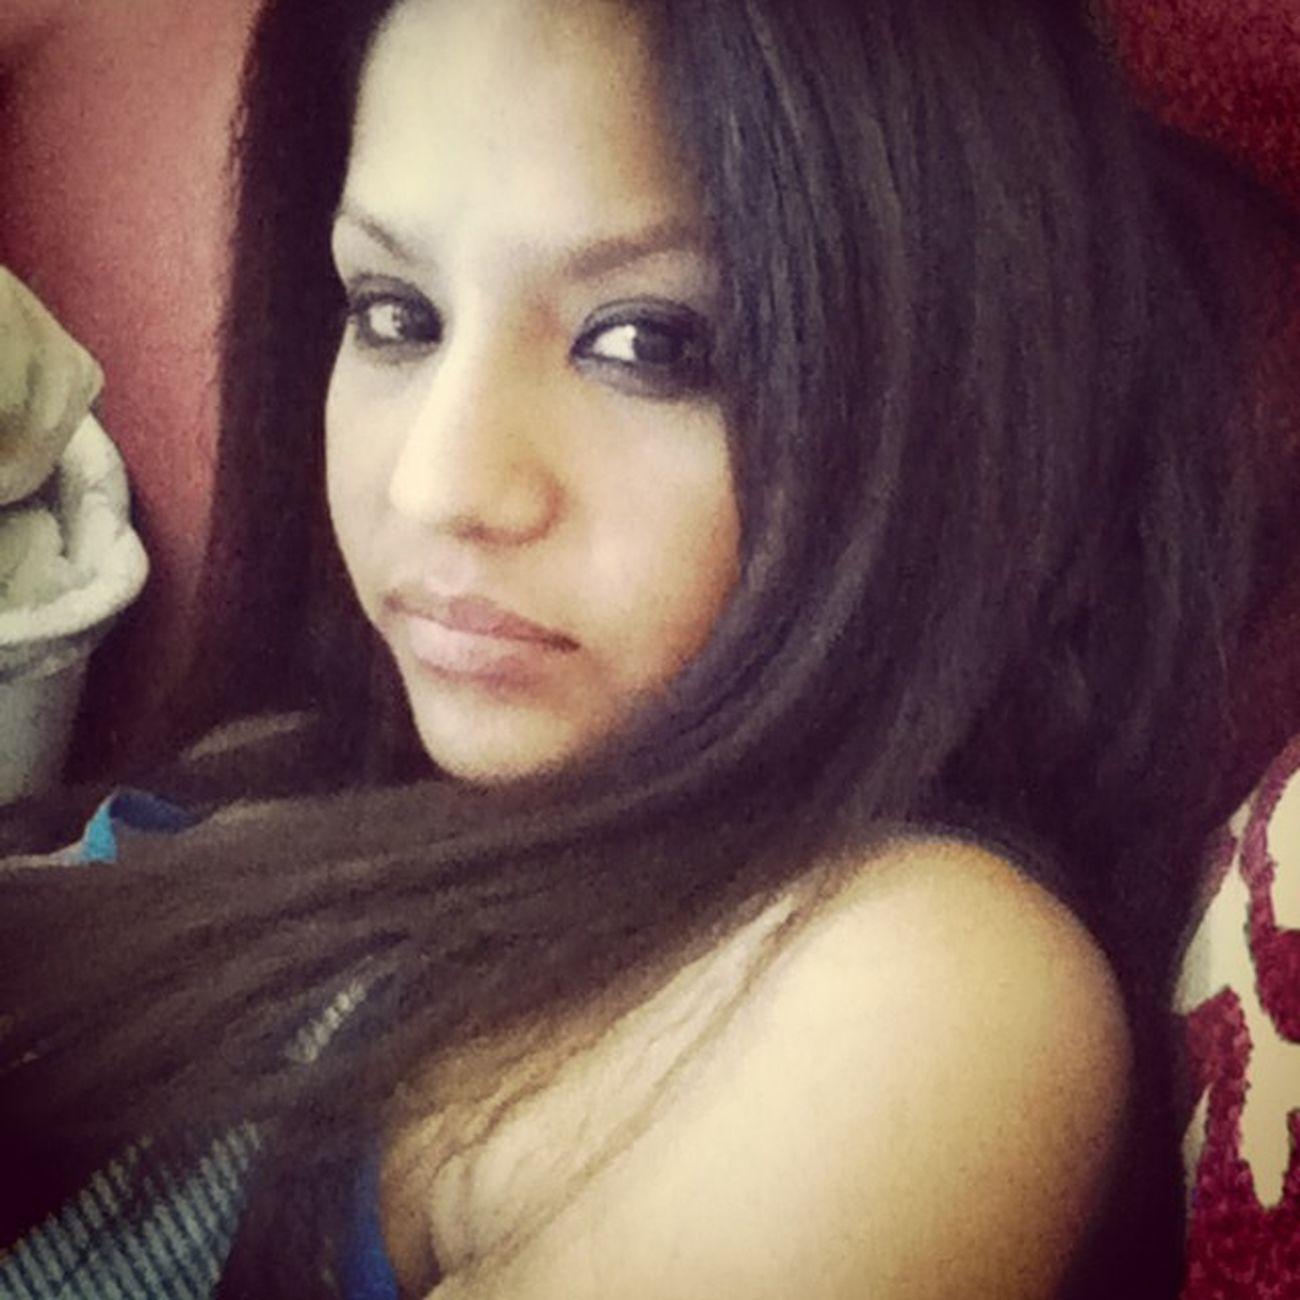 Chill Noche SUERTE Chica Latinstyle Peru ' Perucha Nenalatina Tachula Estoycansada Ashtag Instagram